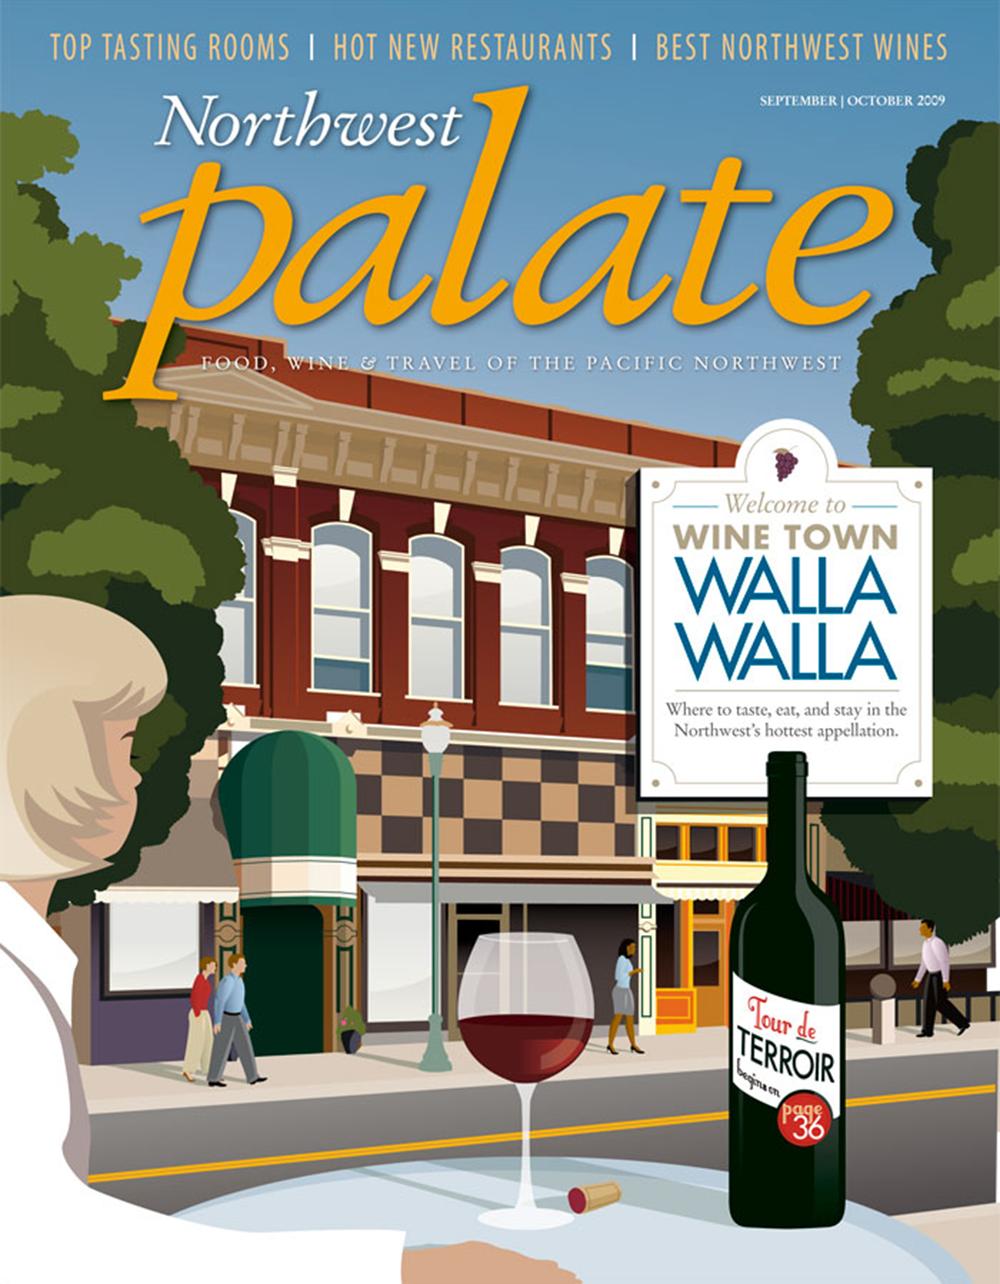 Northwest_Palate_Walla_Walla_Wine_Illustration_Design